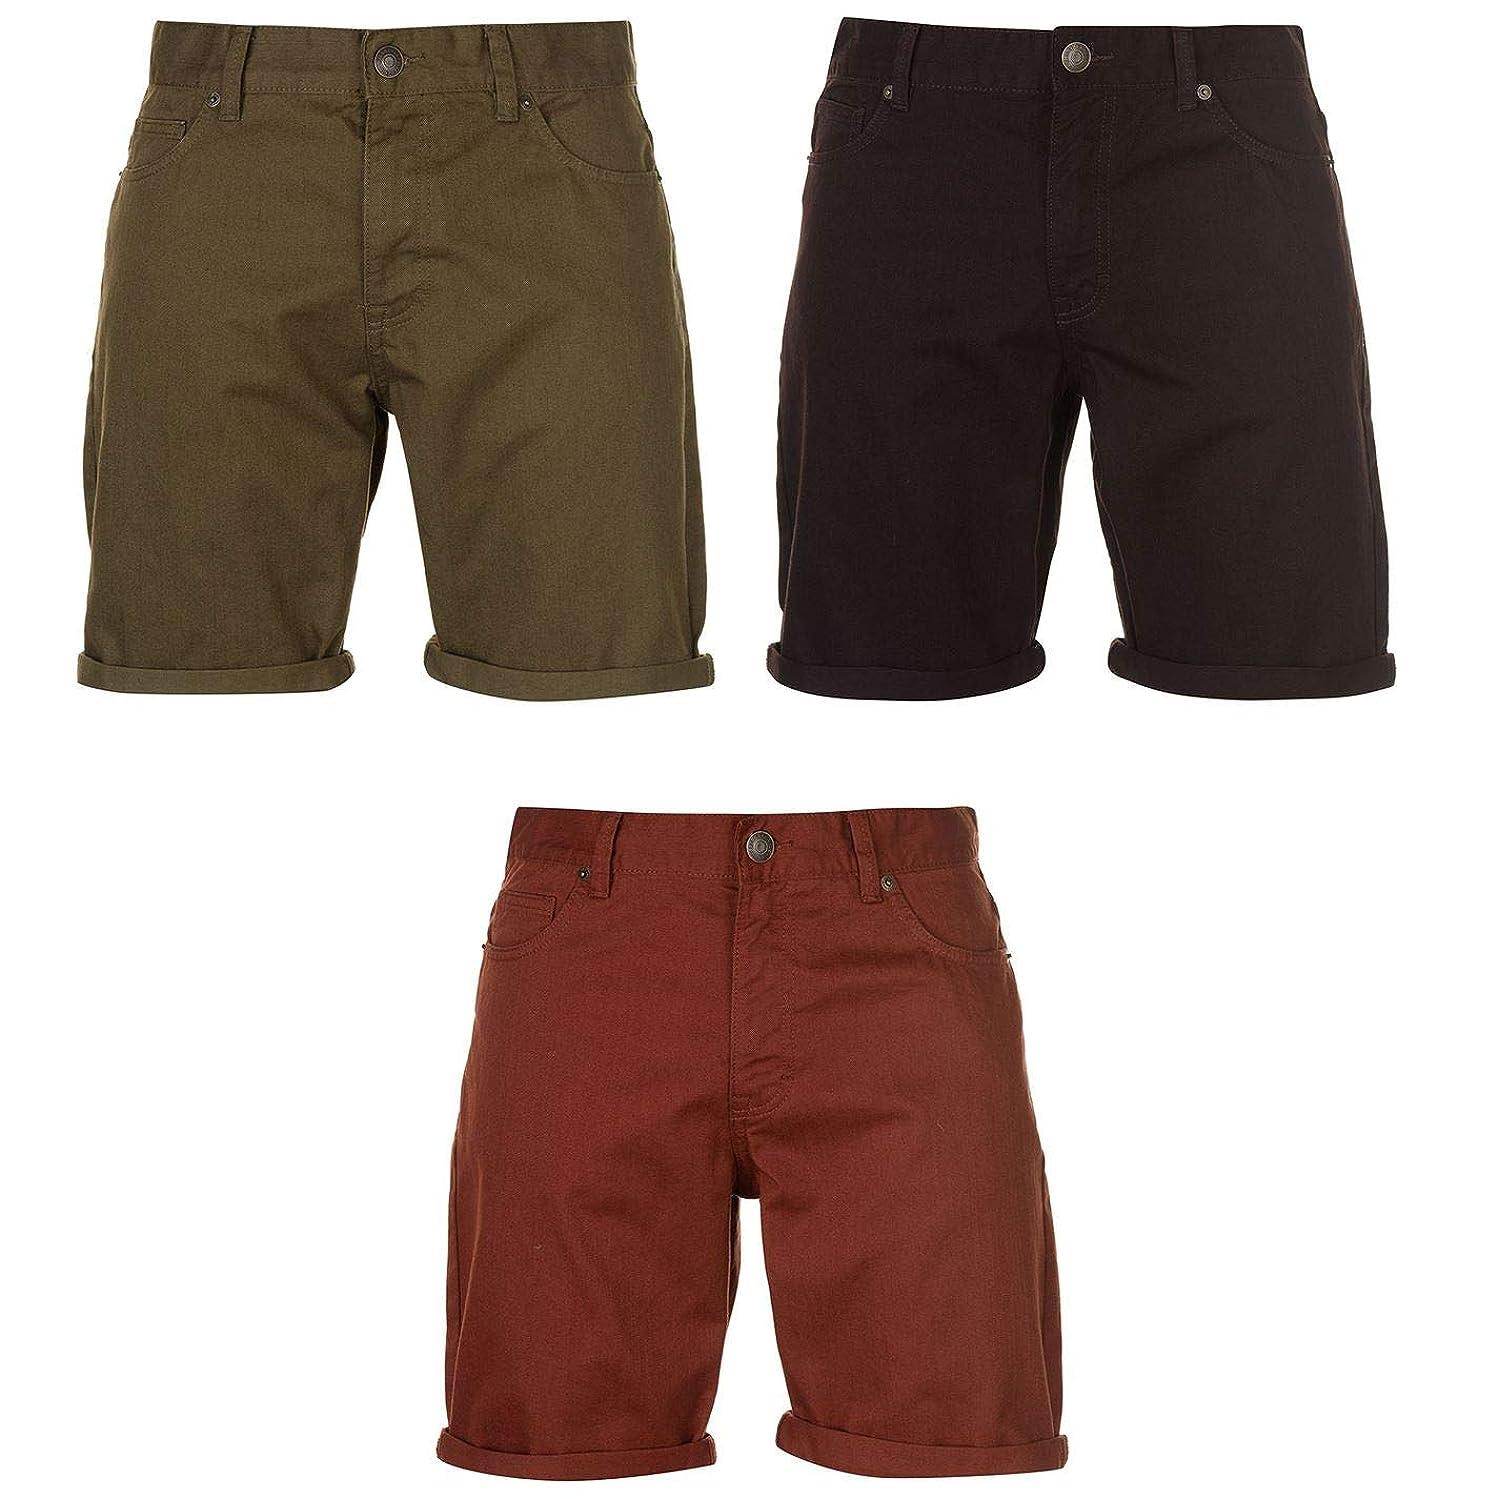 Pierre Cardin Coloured Denim Shorts Mens Bottoms Short Pants Summerwear